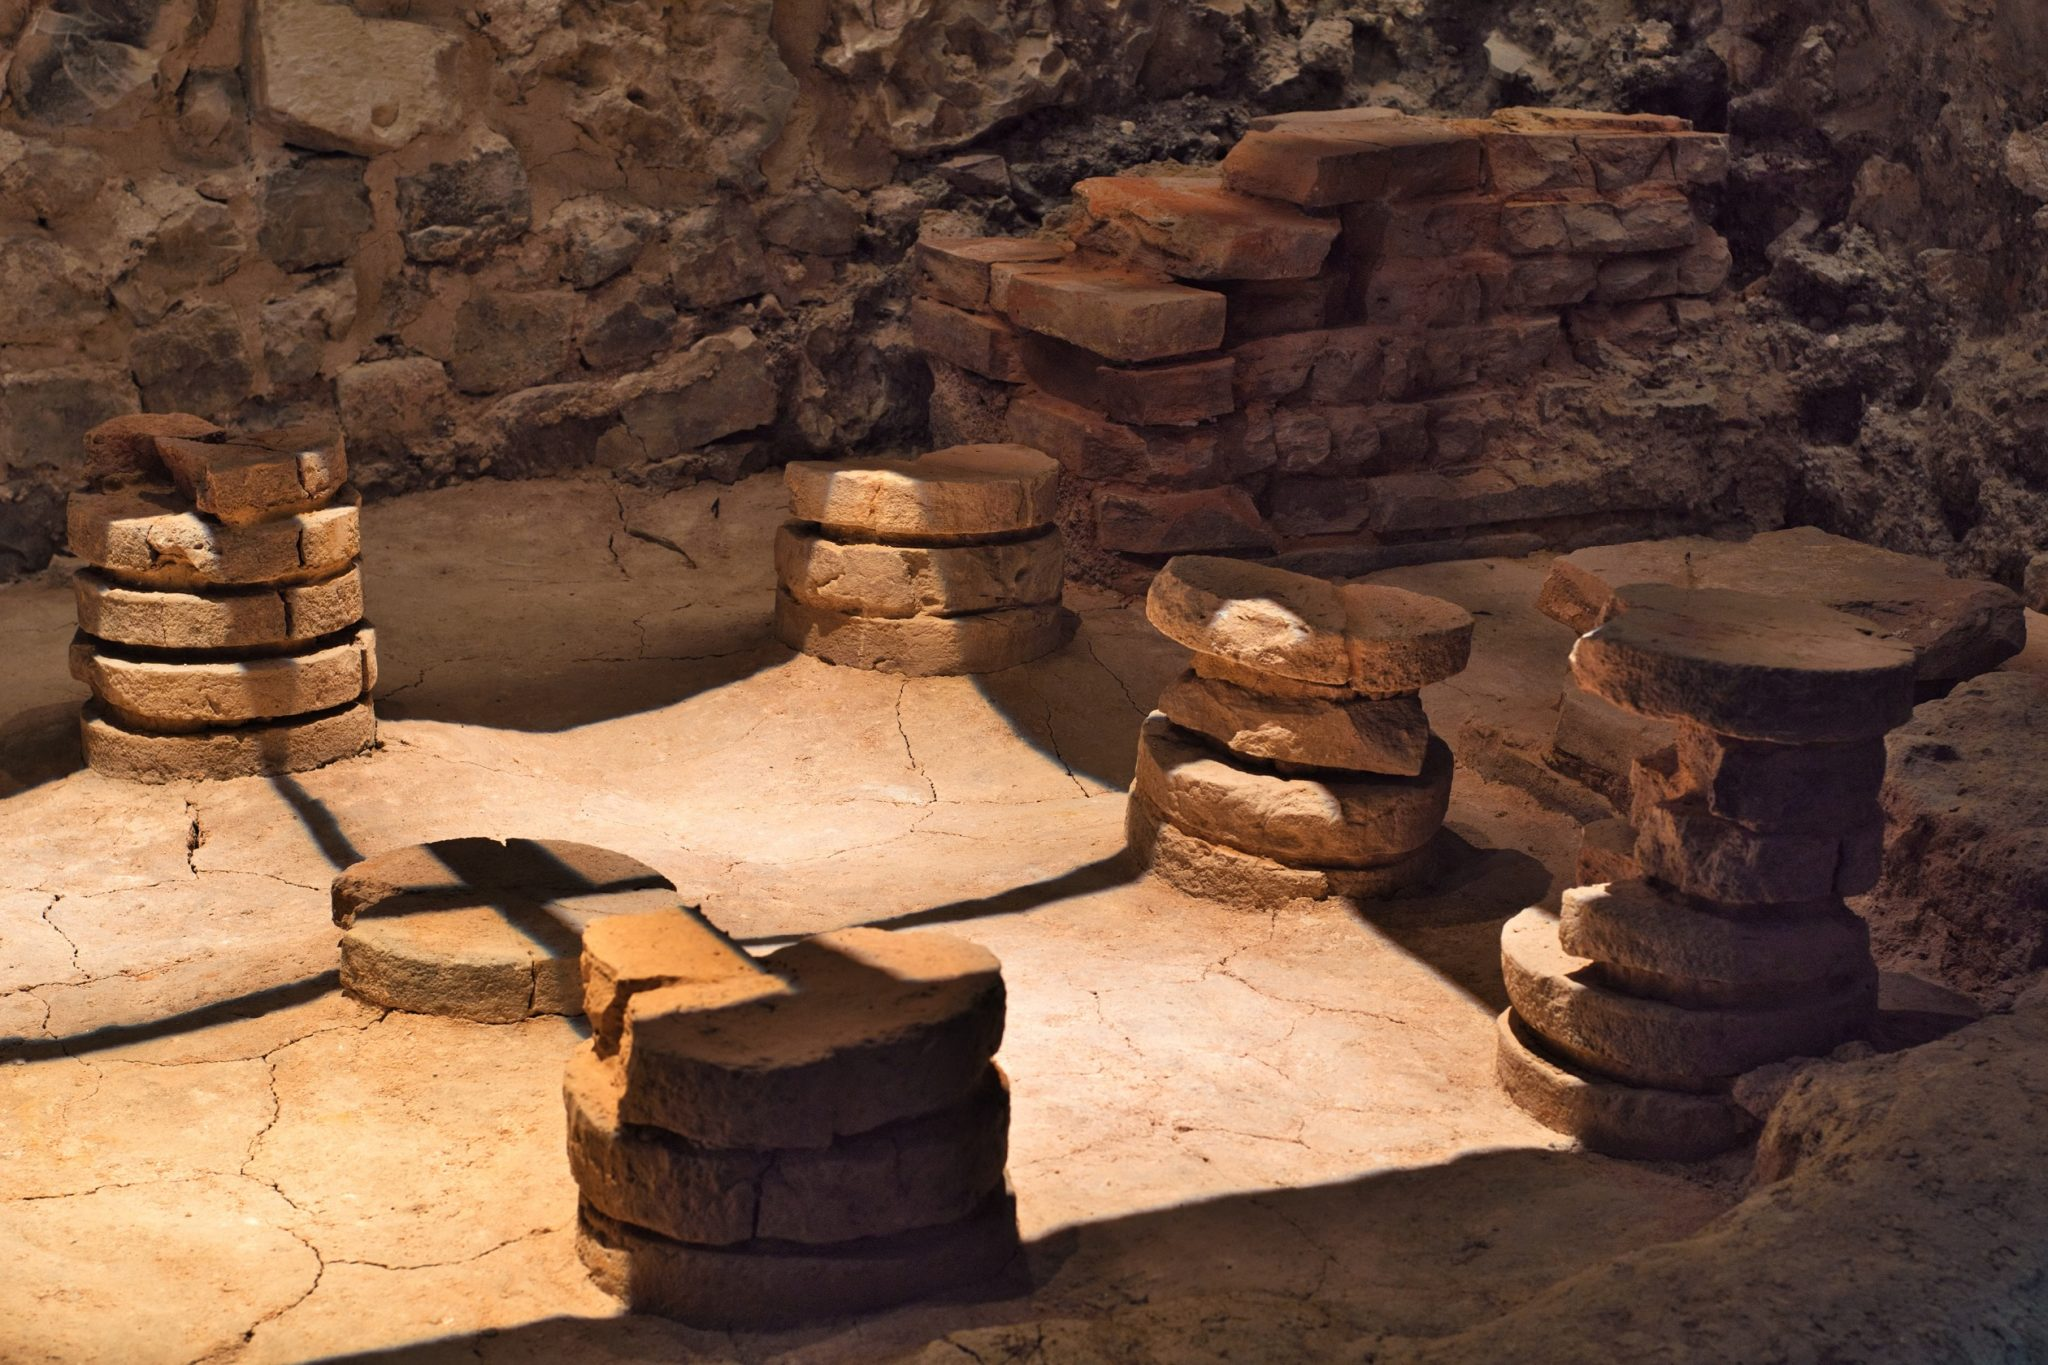 Teseum - Archeologische site - Eddy Dens (2)